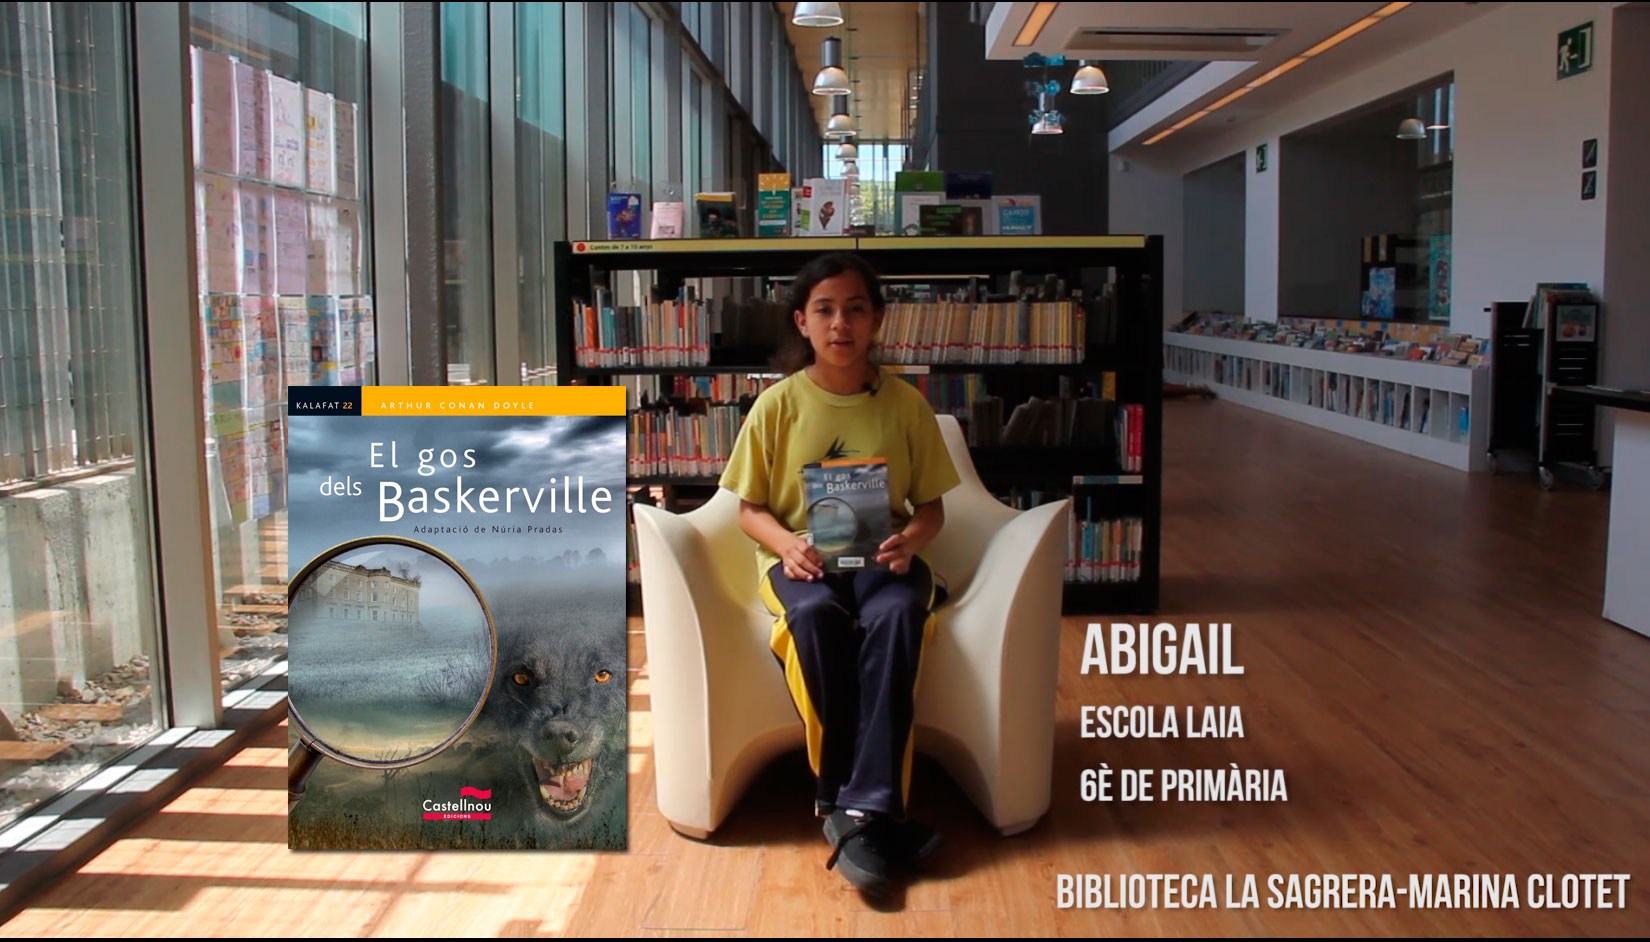 Booktubers a la Biblioteca La Sagrera-Marina Clotet: Abigail